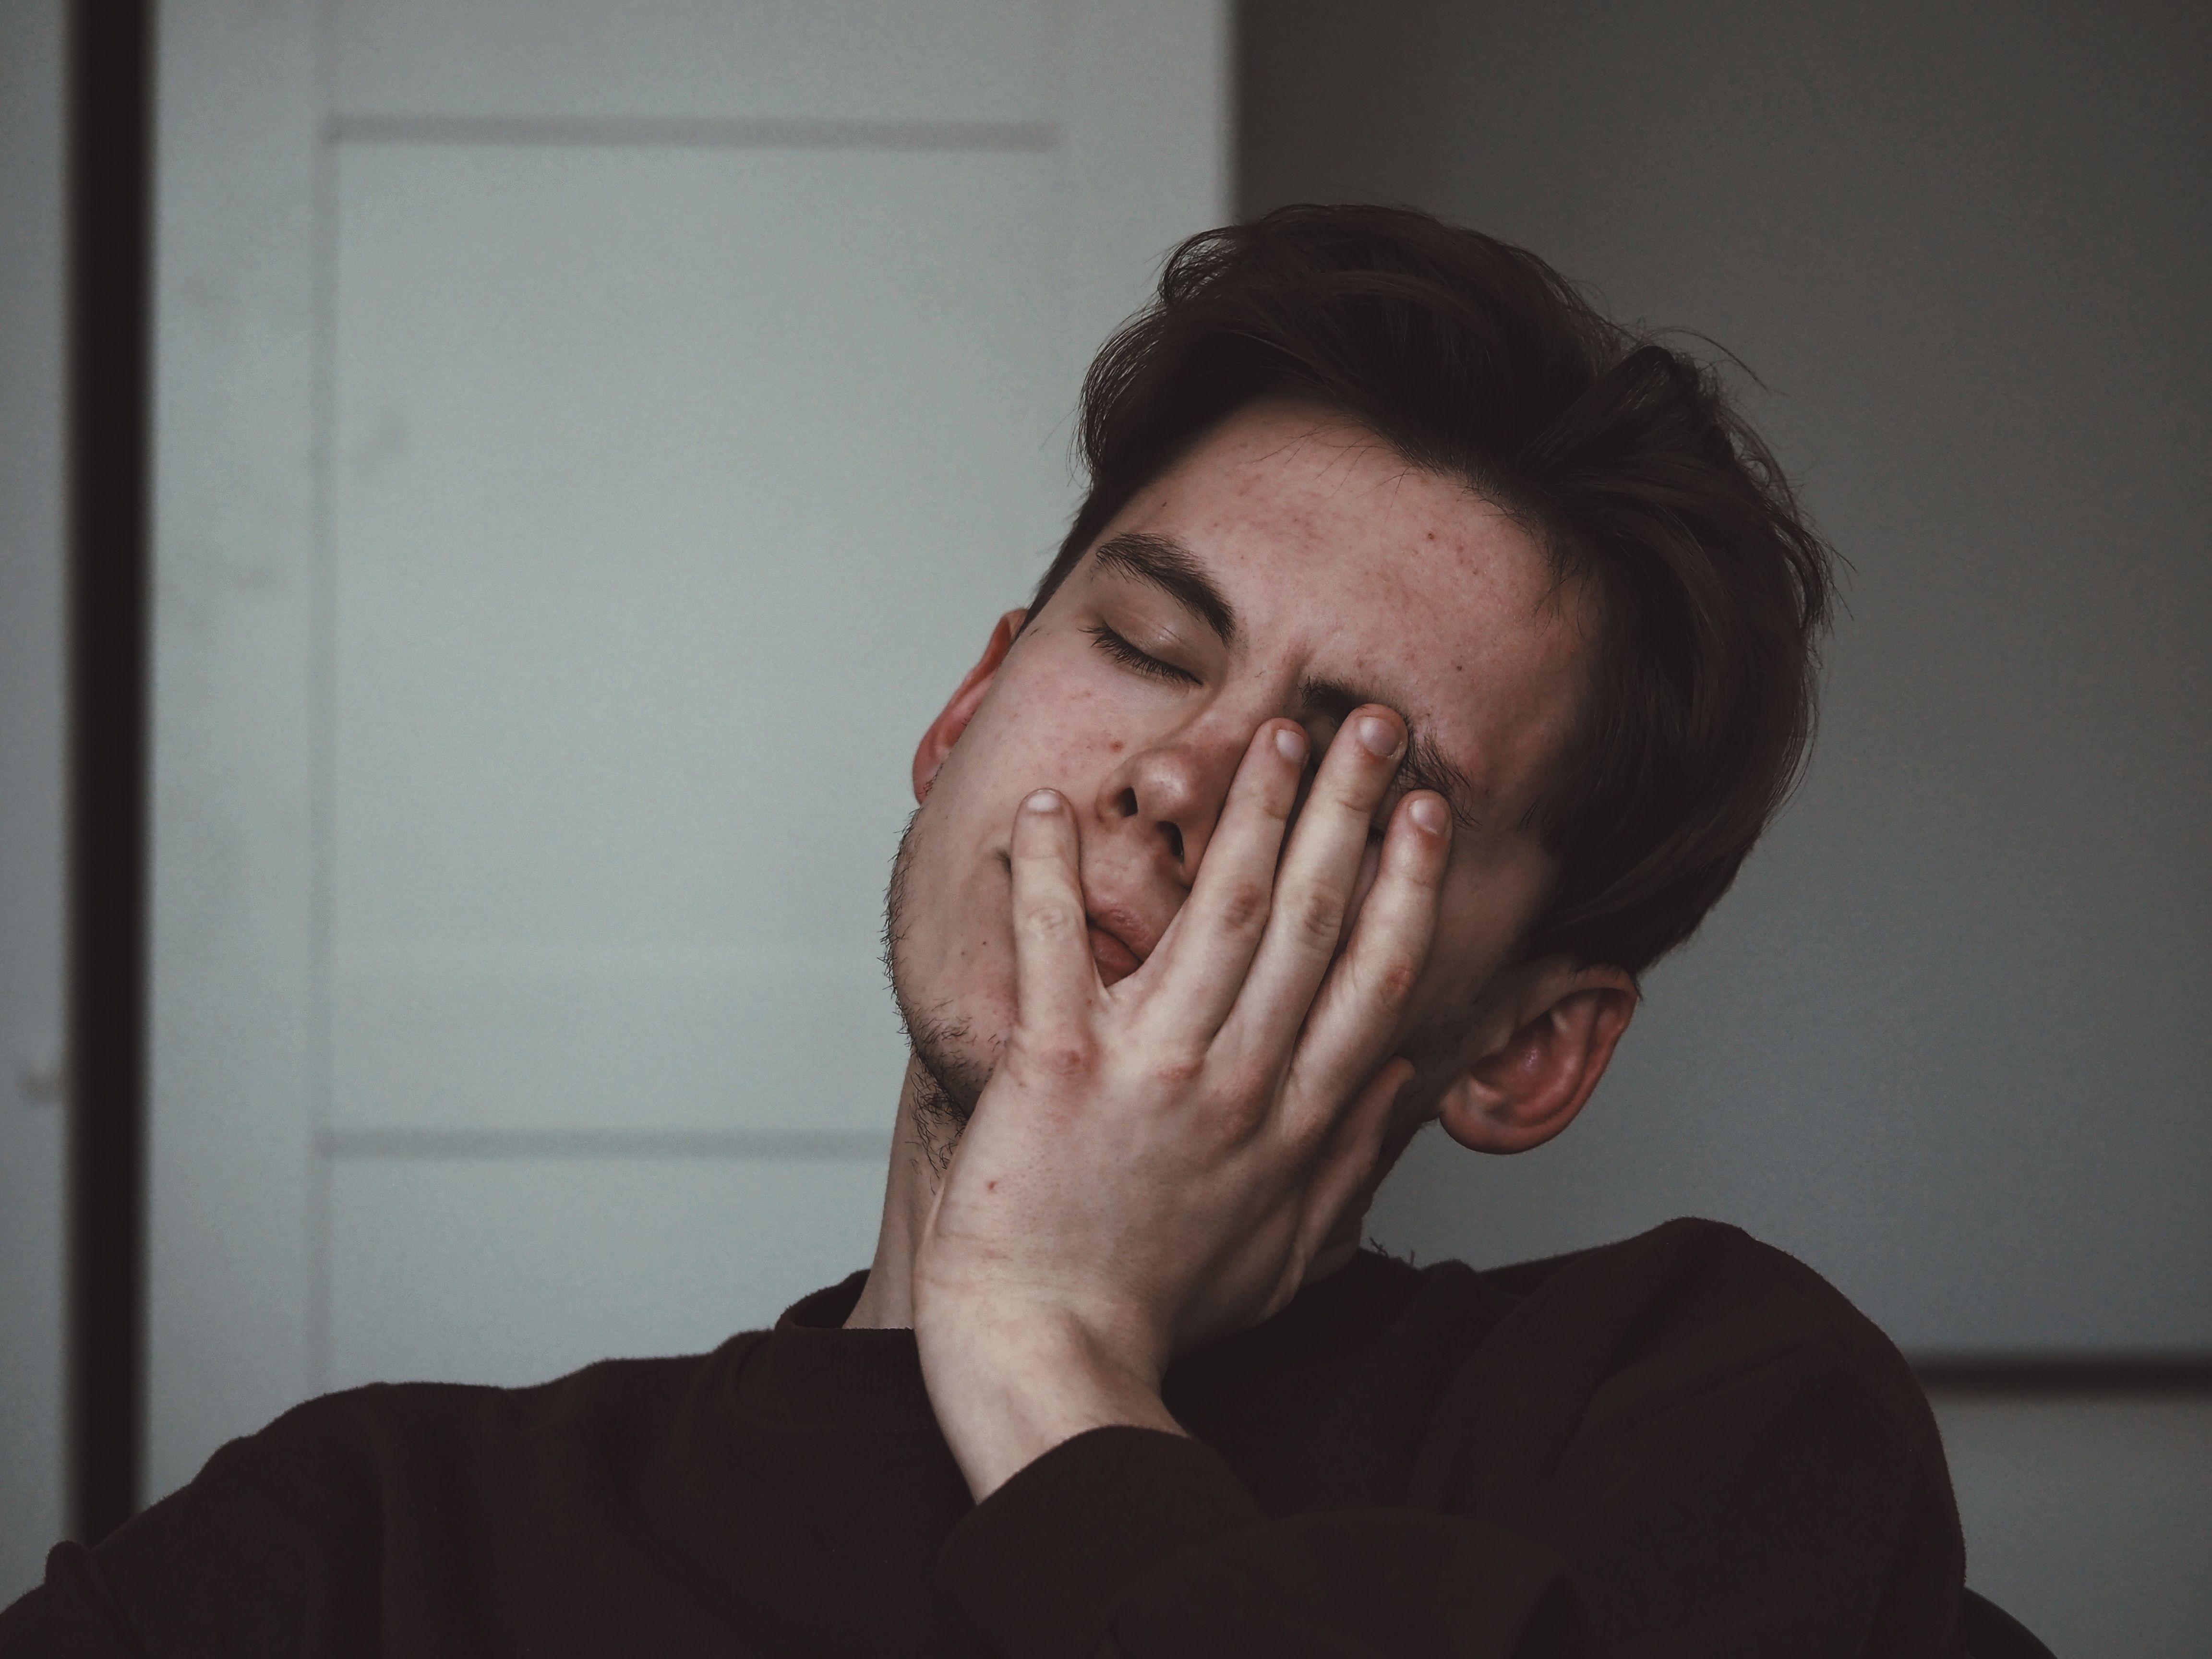 Young man expressing fatigue.